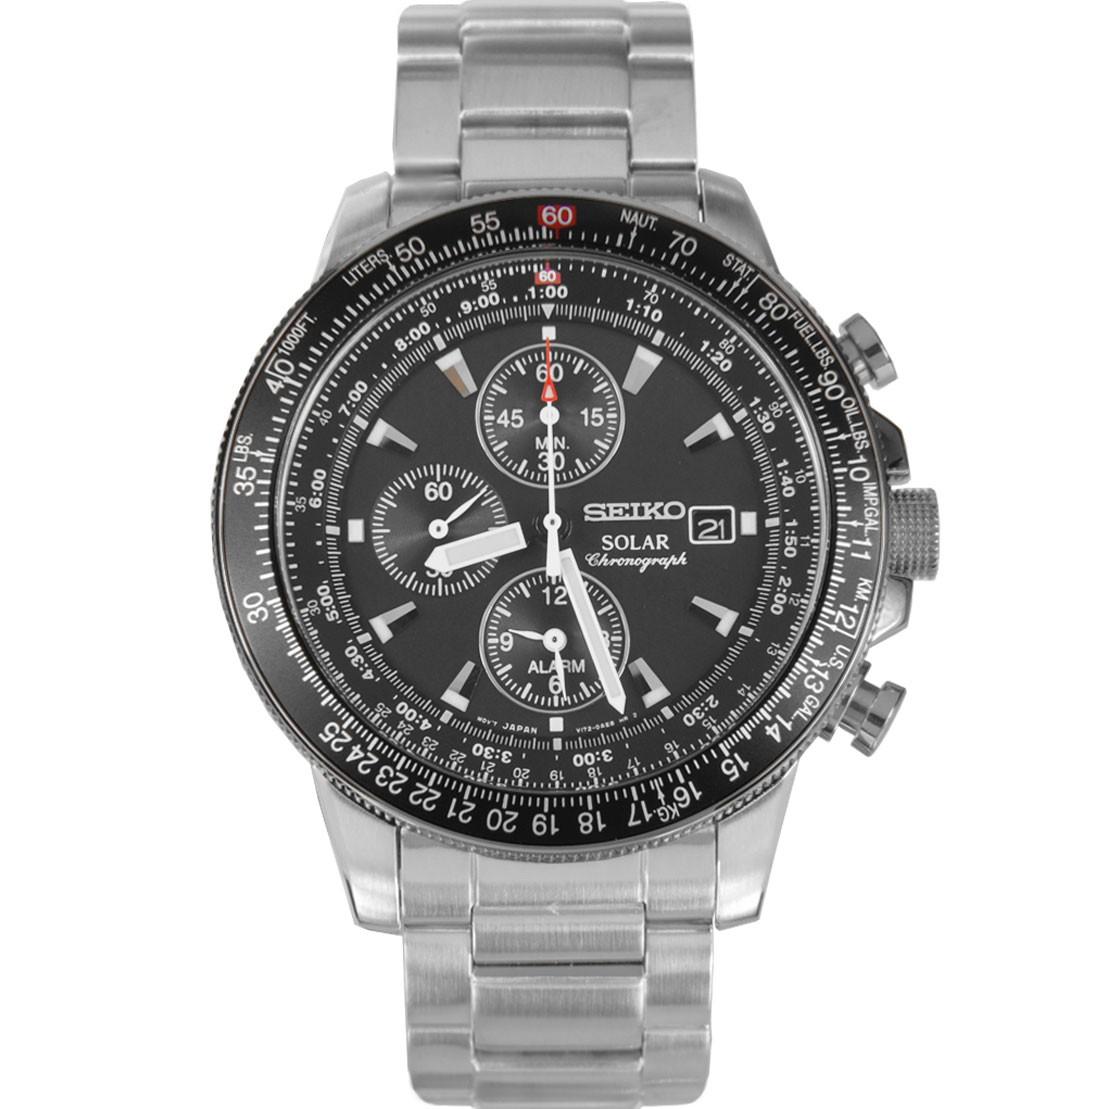 SEIKO Pilot's Solar Chronograph Alarm Men's Watch รุ่น SSC009P1